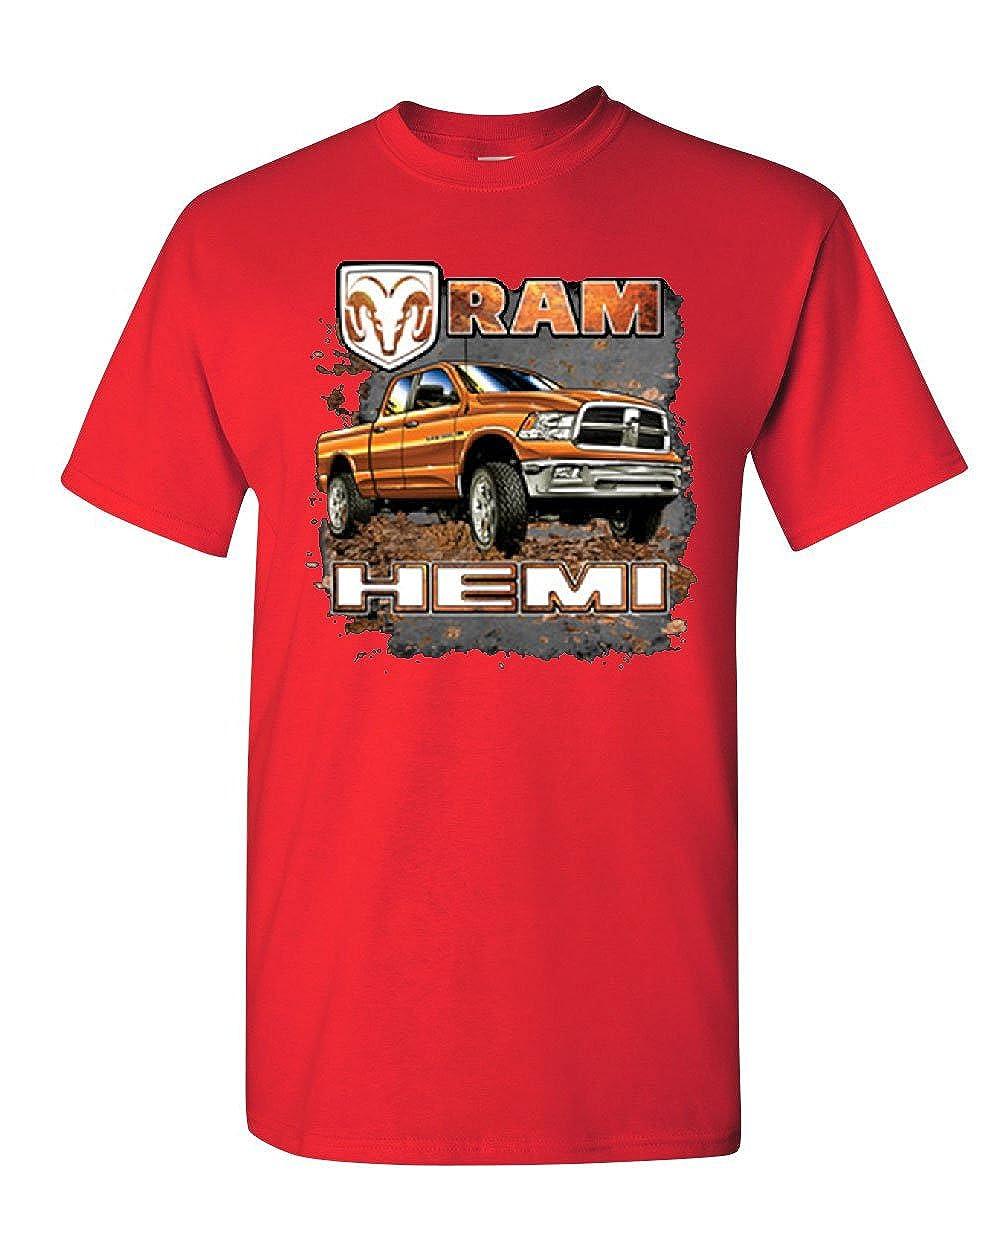 Dodge Ram Hemi T-Shirt Dodge Truck Offroad Licensed Tee Shirt